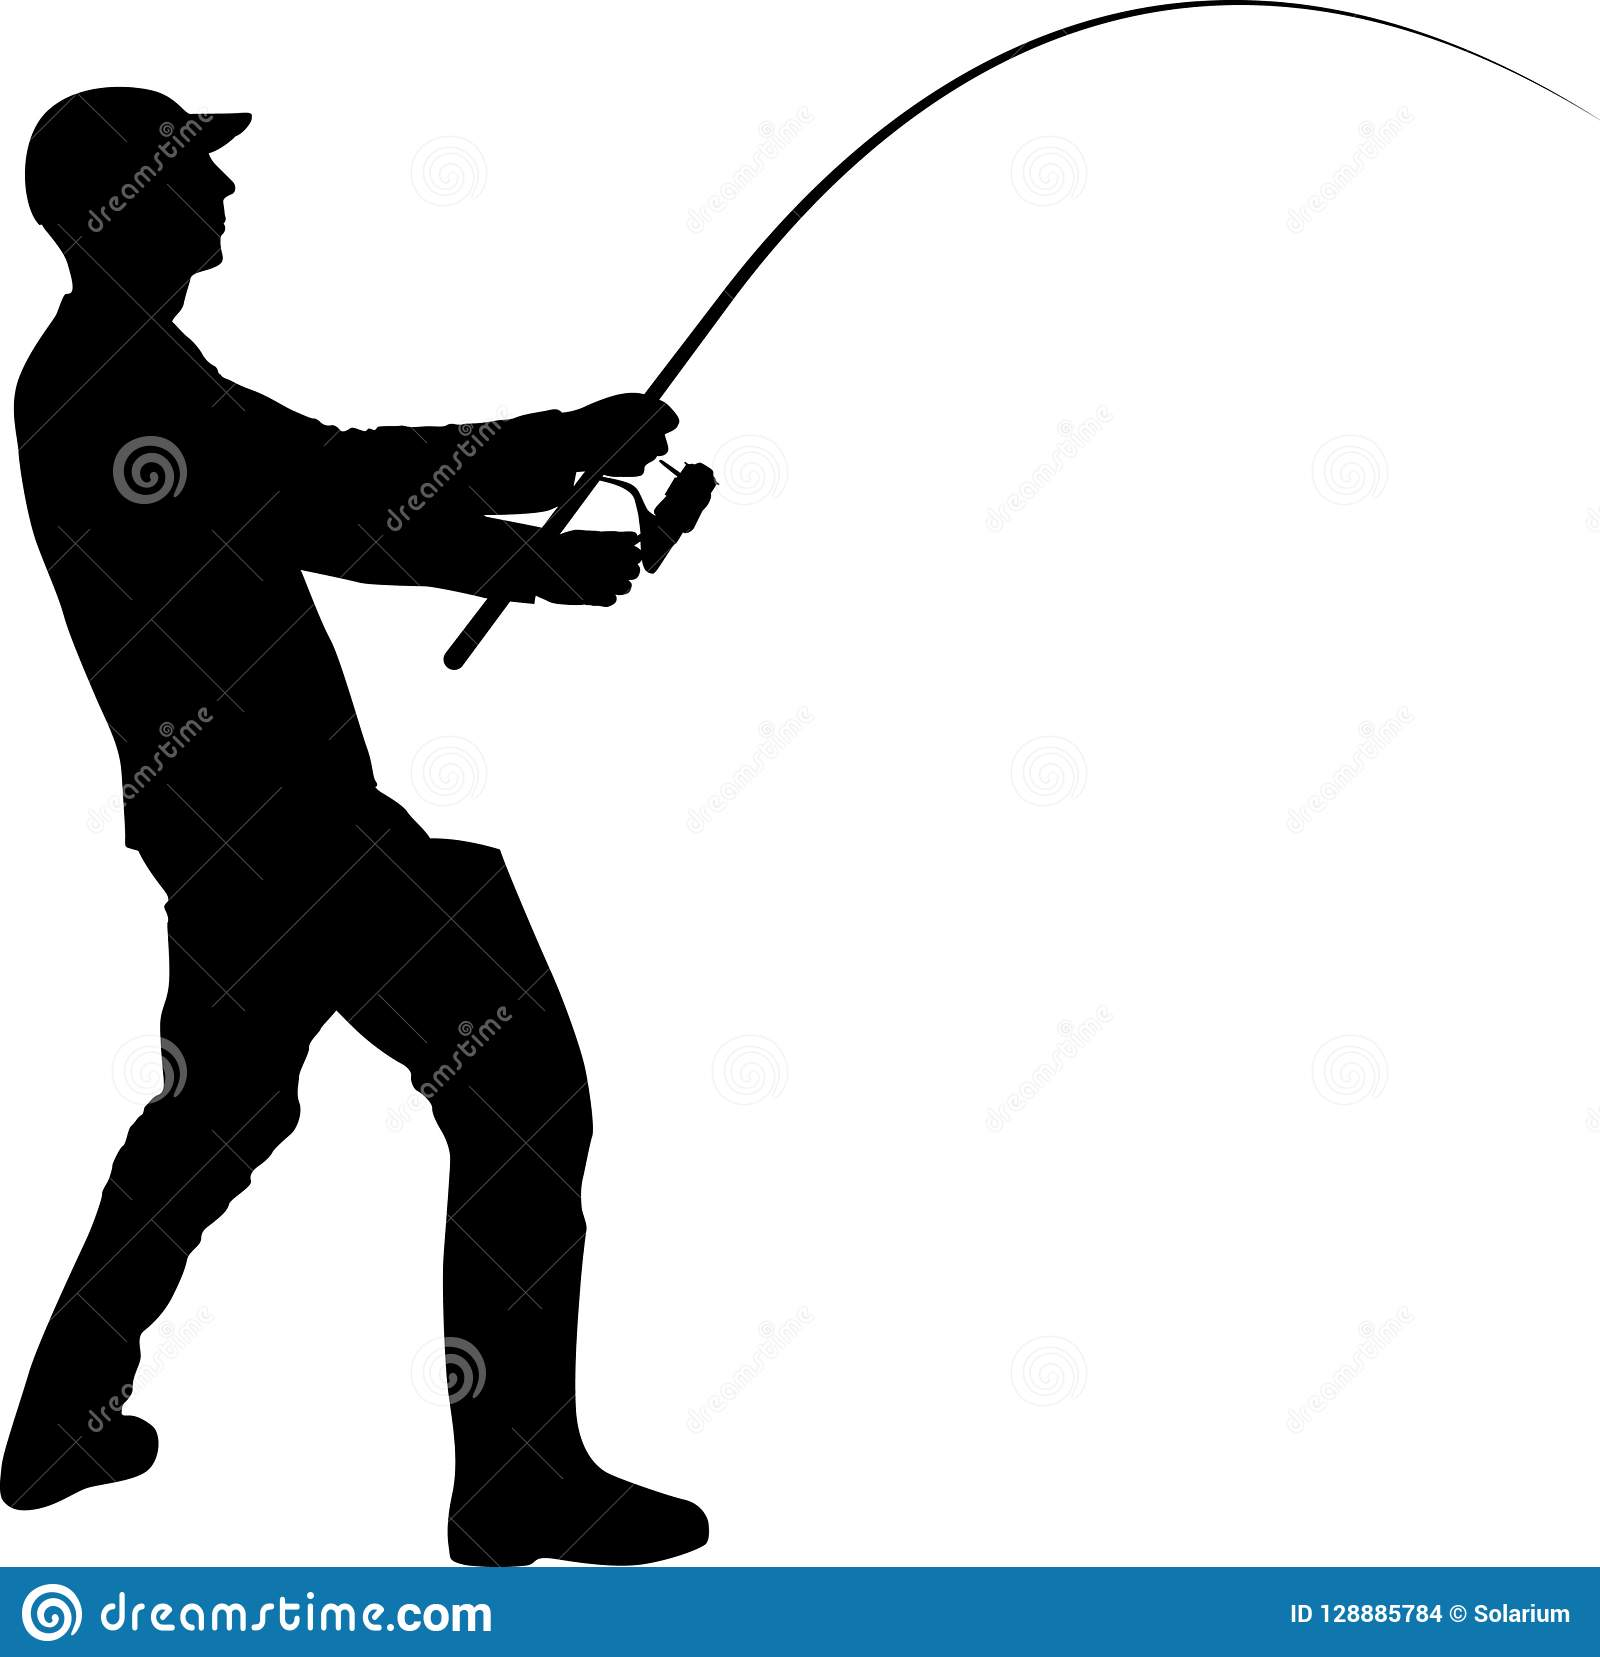 Download Bent Fishing Rod Stock Illustrations 25 Bent Fishing Rod Stock Illustrations Vectors Clipart Dreamstime